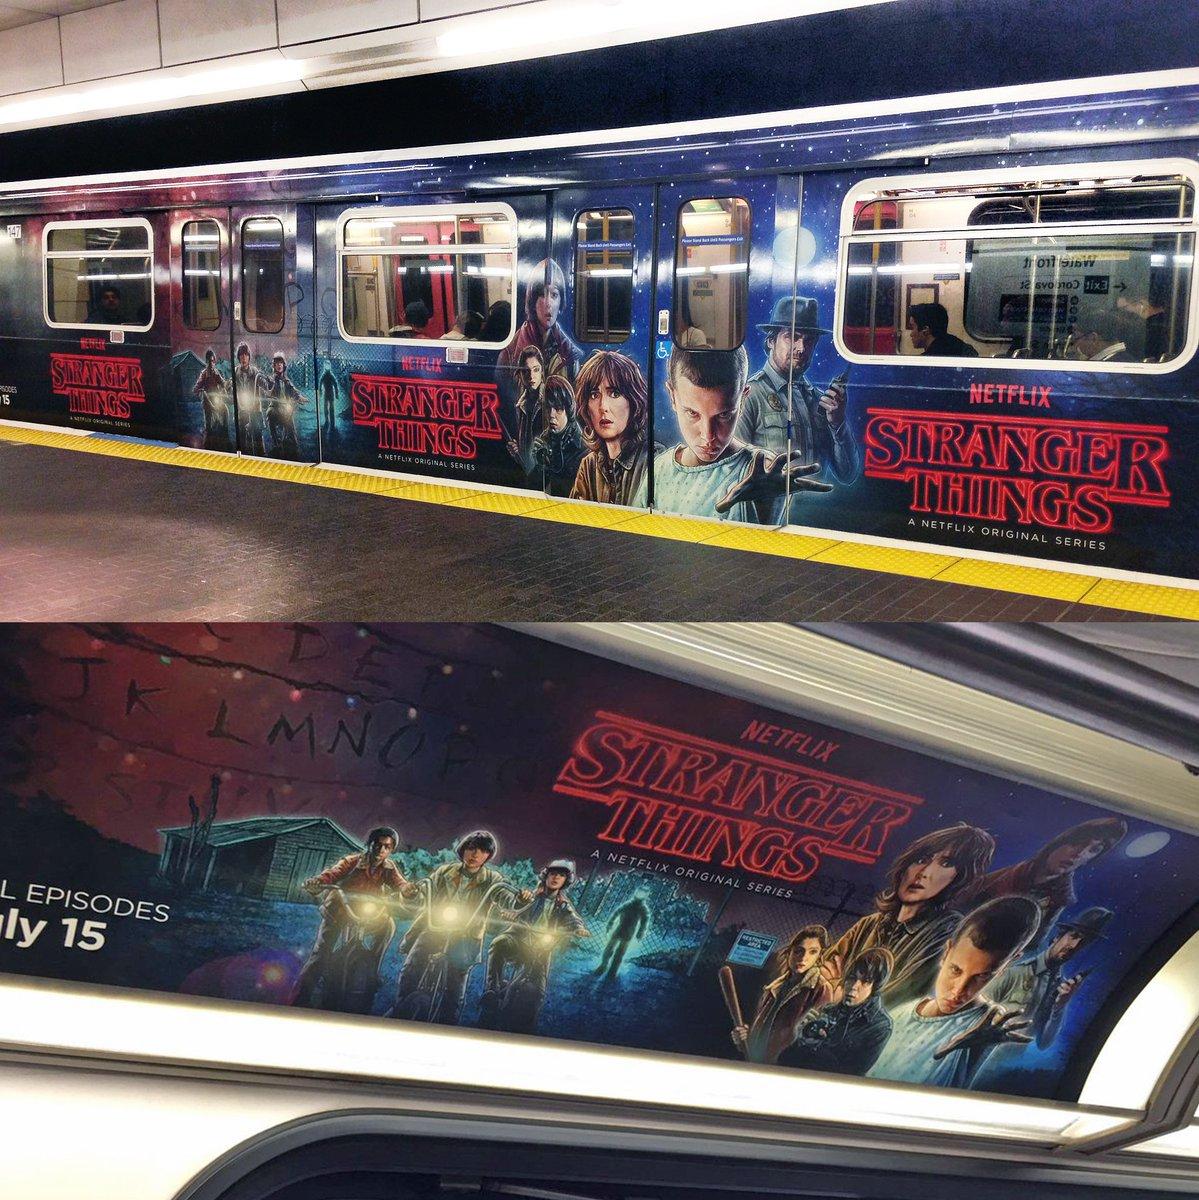 Stranger Things出现在温哥华天车上 (图片来自网络)